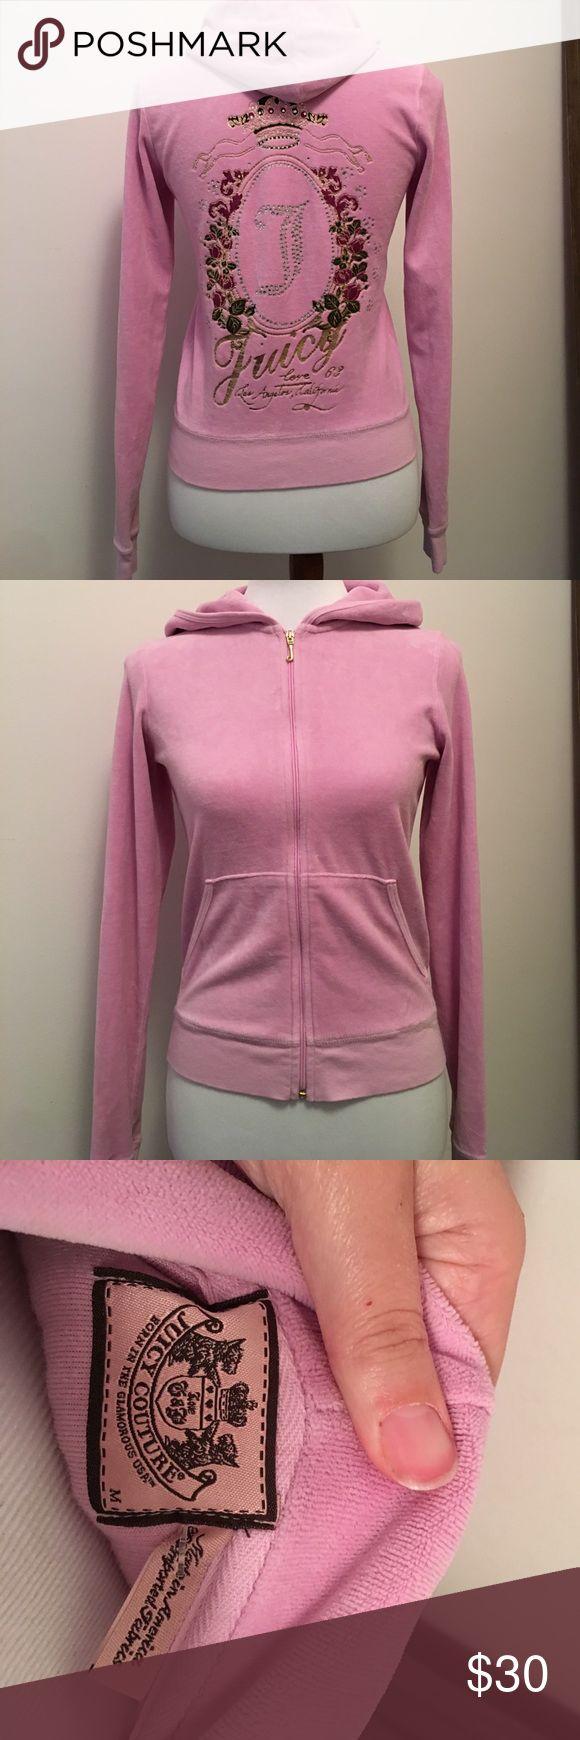 JUICY COUTURE Pink zip up hooded sweat jacket Juicy couture pink zip up sweat jacket. Has good. In EUC. Size medium. Runs small. Juicy Couture Tops Sweatshirts & Hoodies